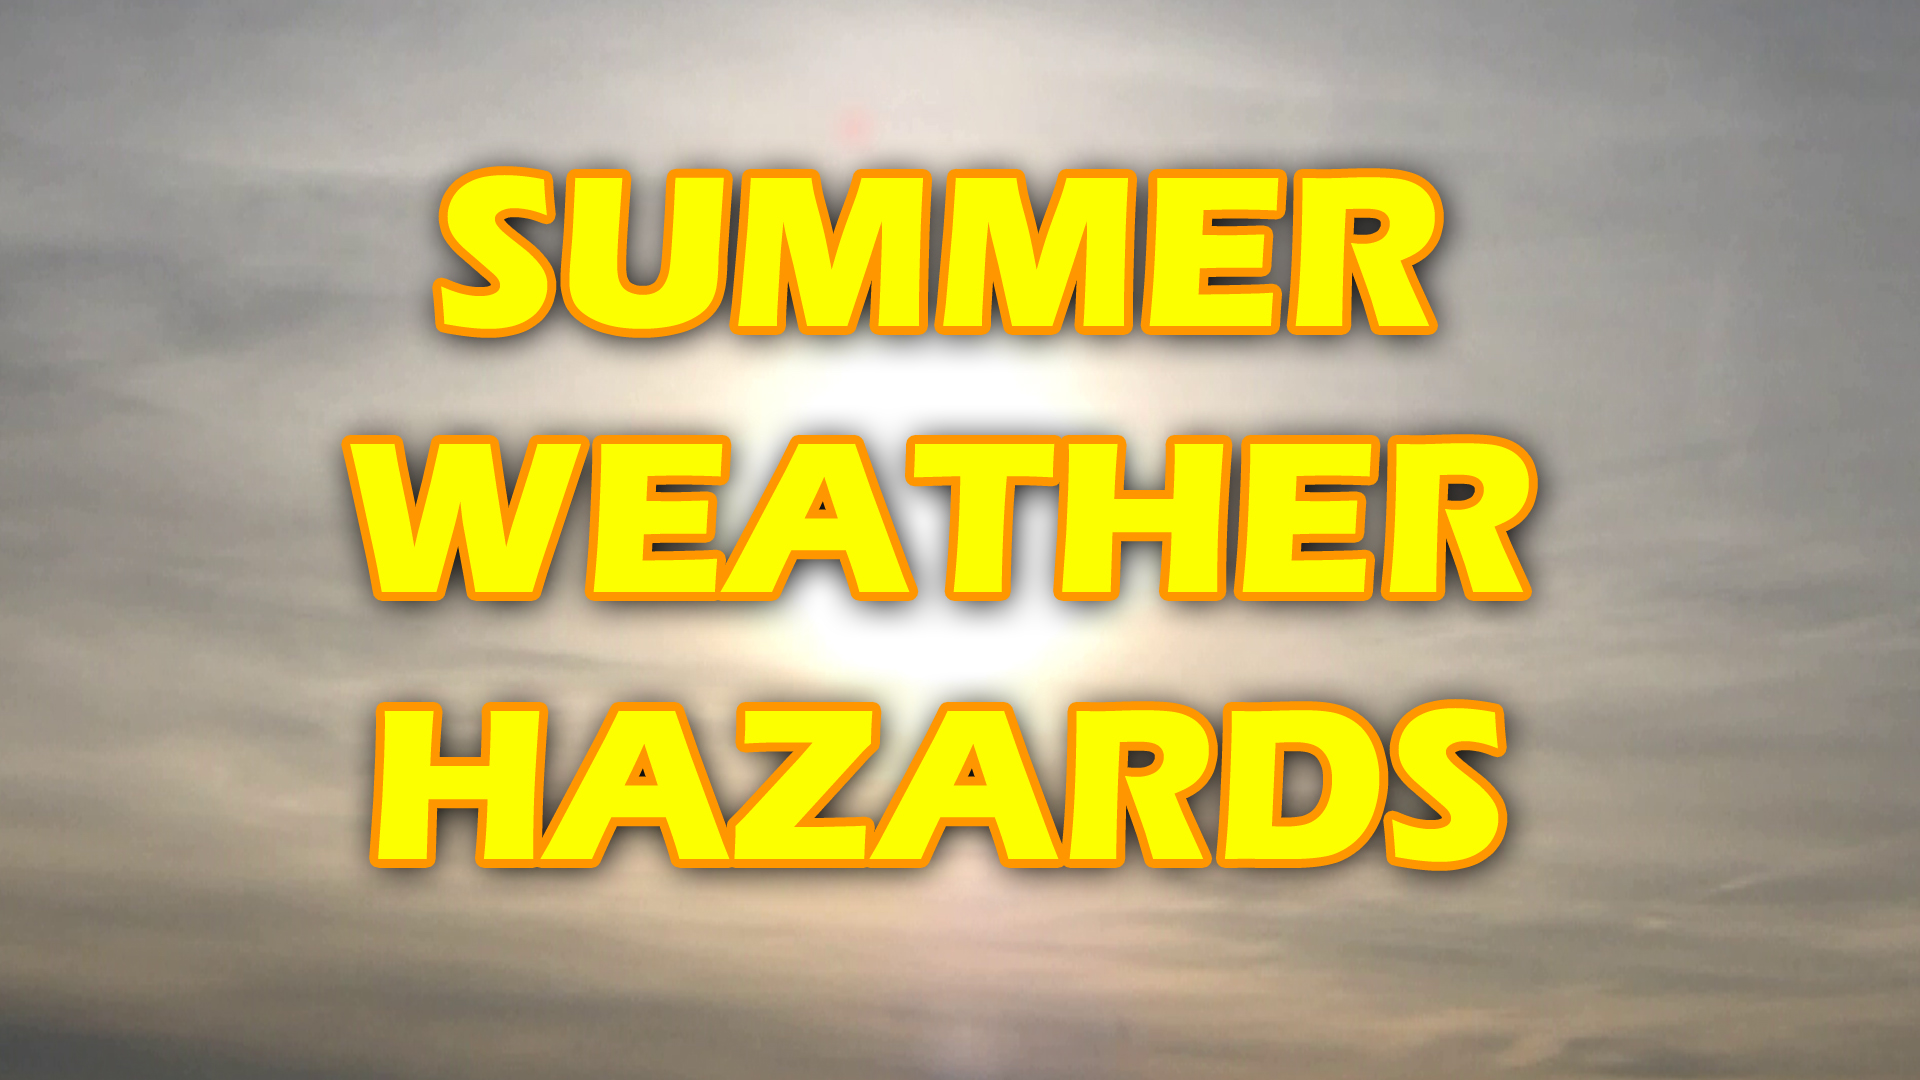 Summer Weather Hazards heat ozone uv radiation